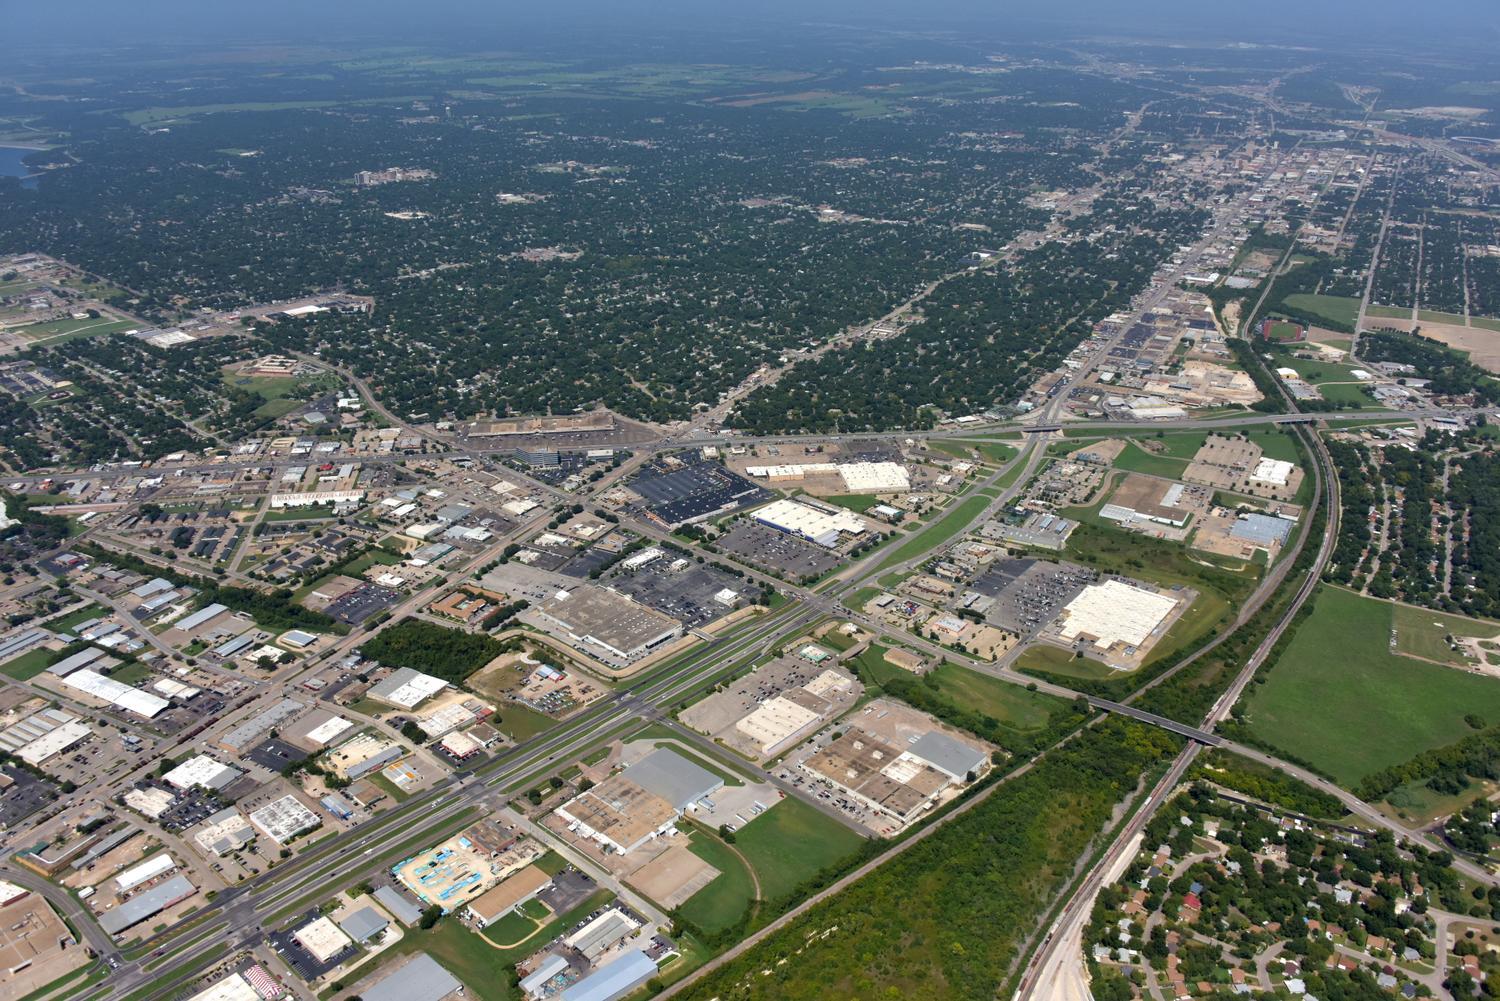 Waco Retail - Waco Aerial Photographer - Aerial Drone Image - Aerial Drone Video - Waco, TX - Texas